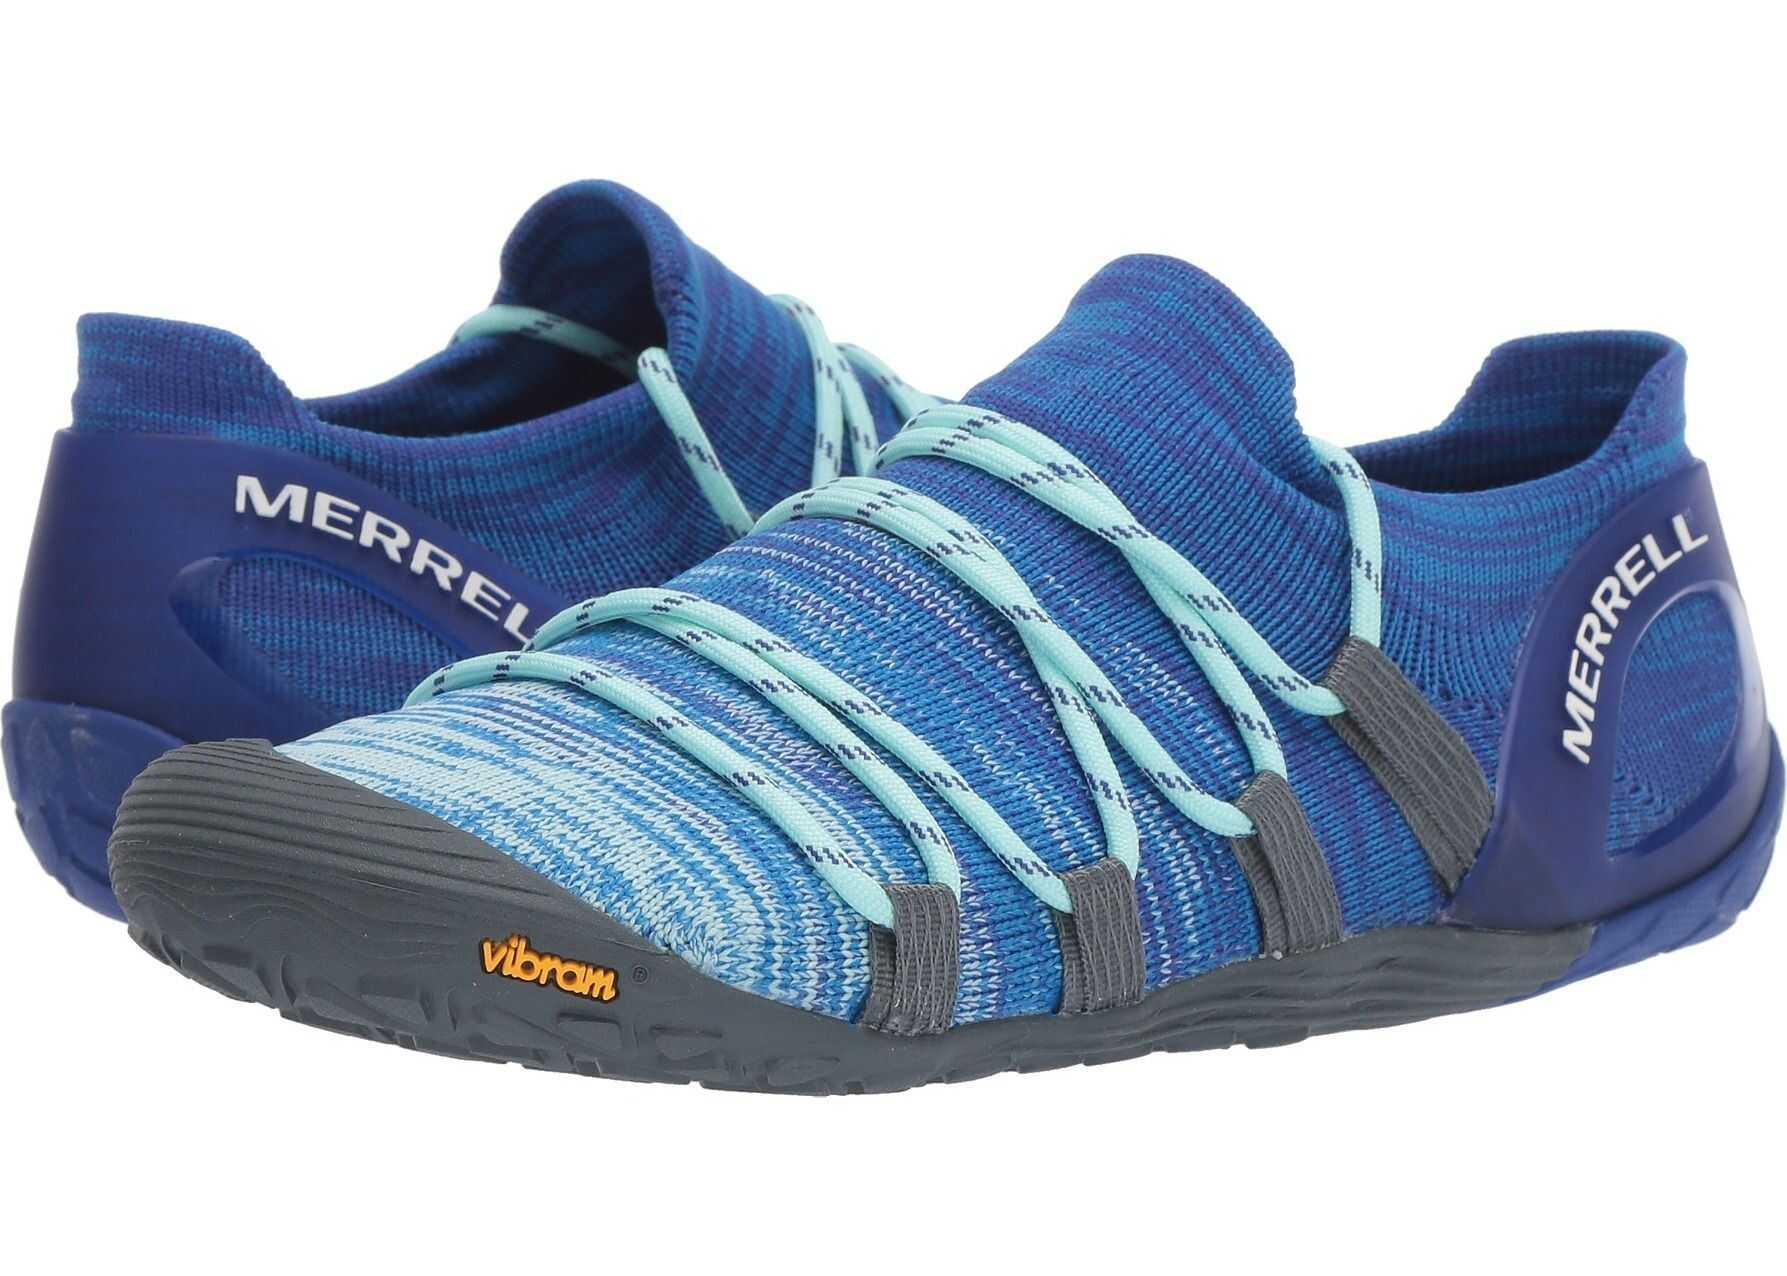 Merrell Vapor Glove 4 3D Aqua/Surf